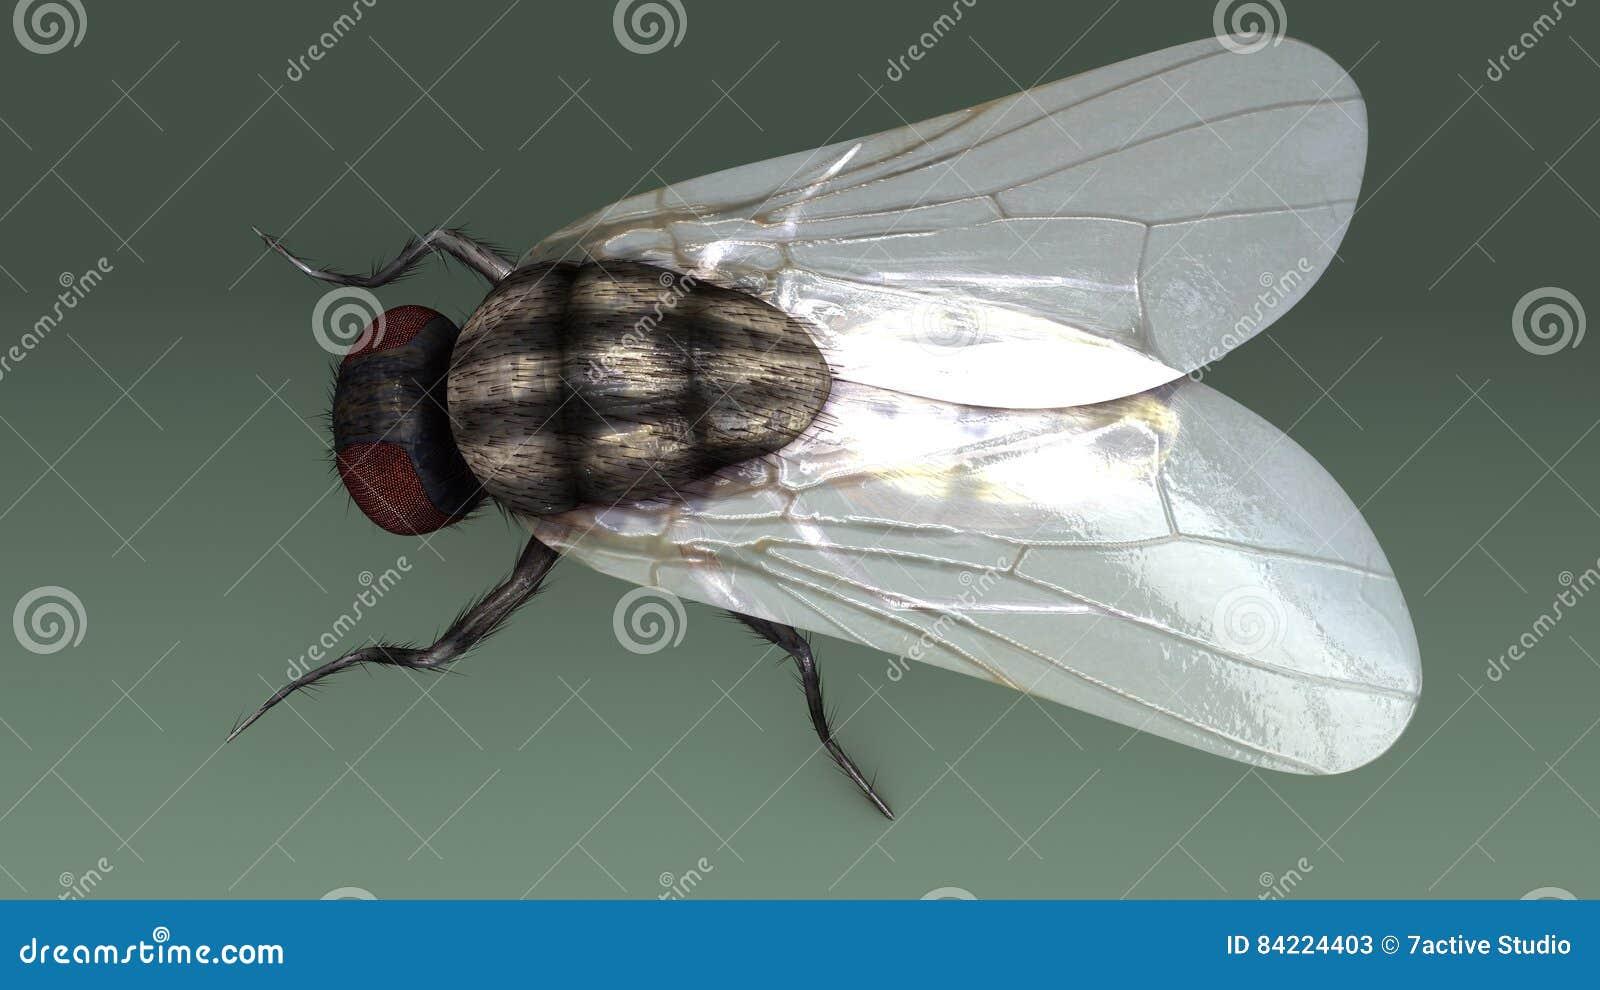 Housefly stock illustration. Illustration of closeup - 84224403